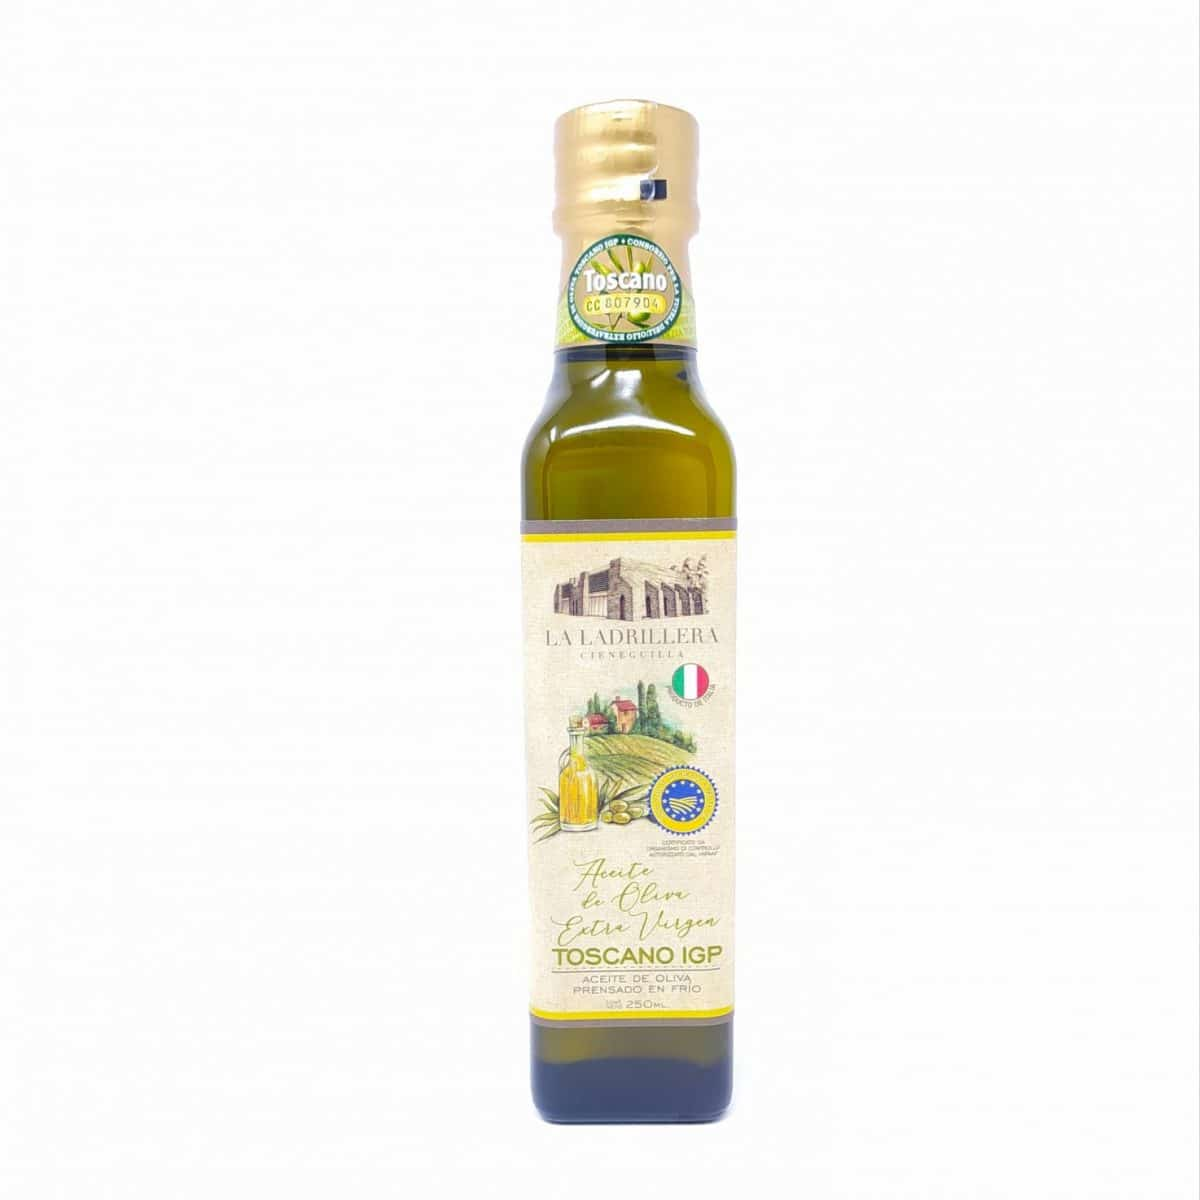 Aceite de Oliva Extra Virgen Toscano IGP, 250ml